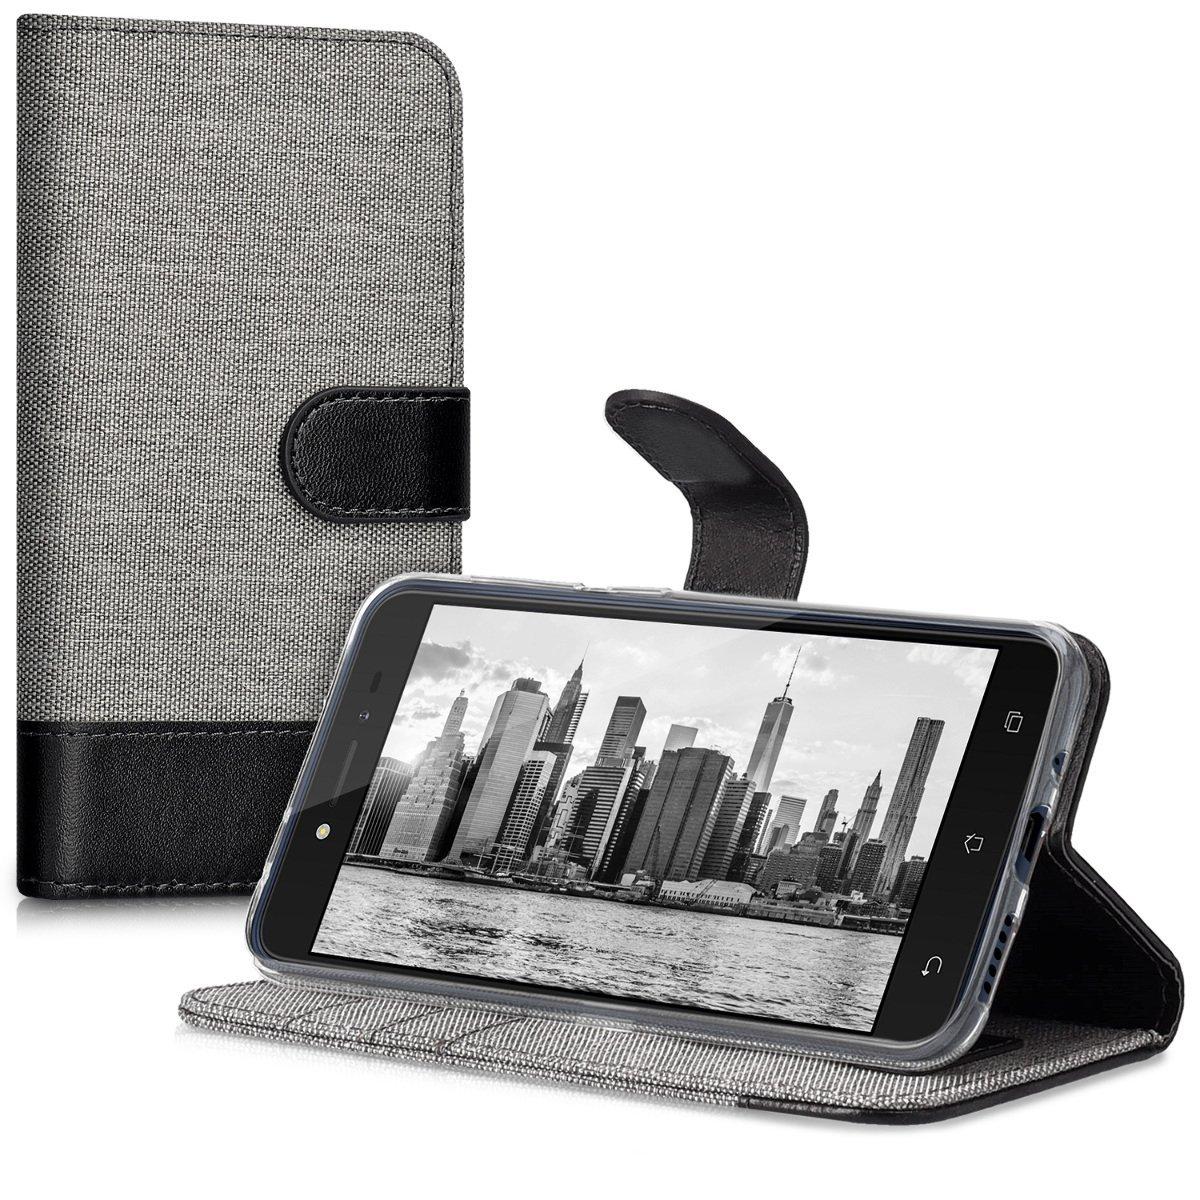 KW Θήκη Πορτοφόλι Asus Zenfone Live - Grey / Black Canvas (41952.01)